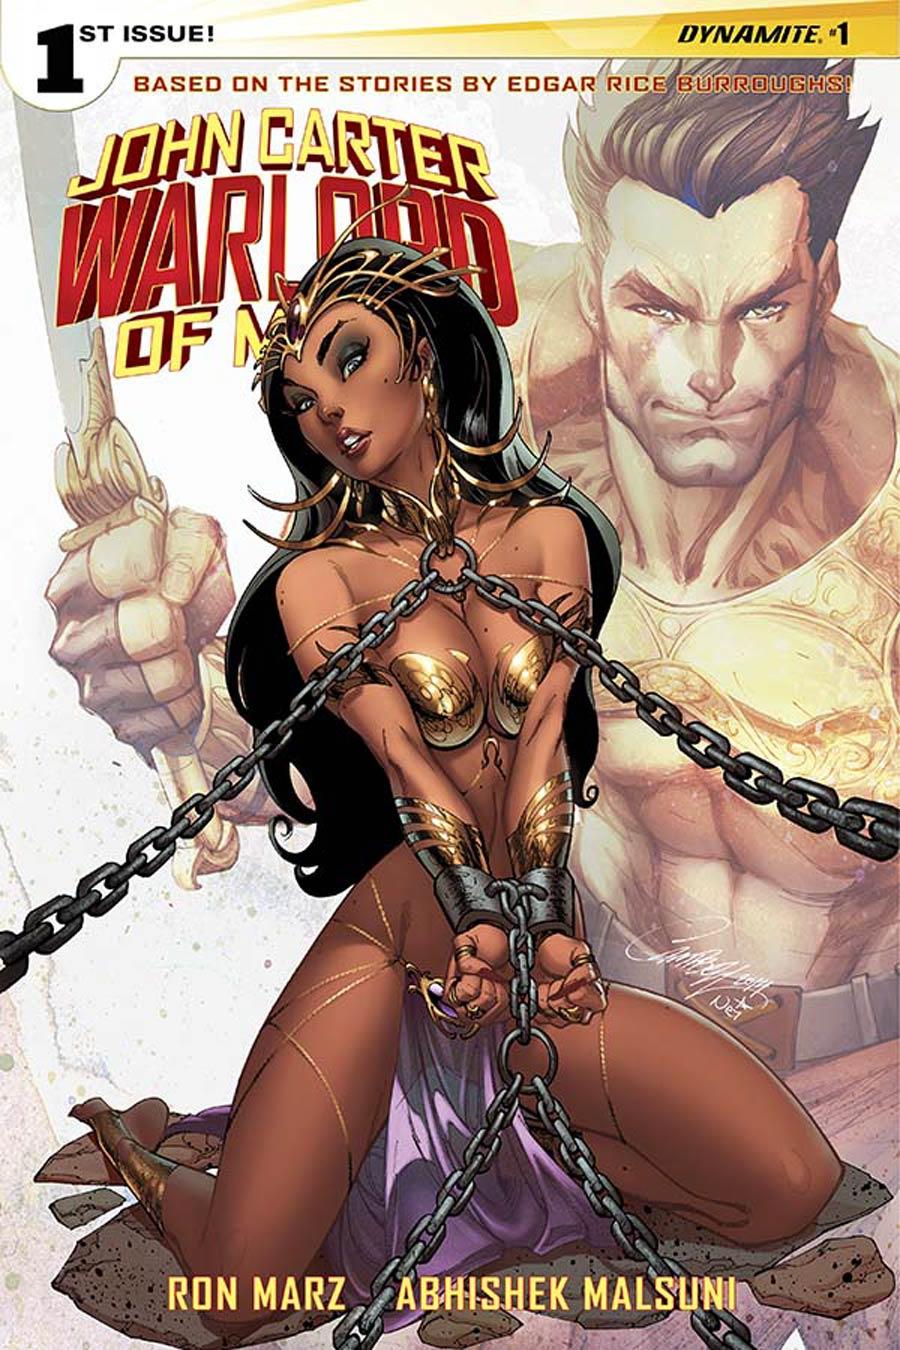 John Carter Warlord Of Mars Vol 2 #1 Cover A Regular J Scott Campbell Cover